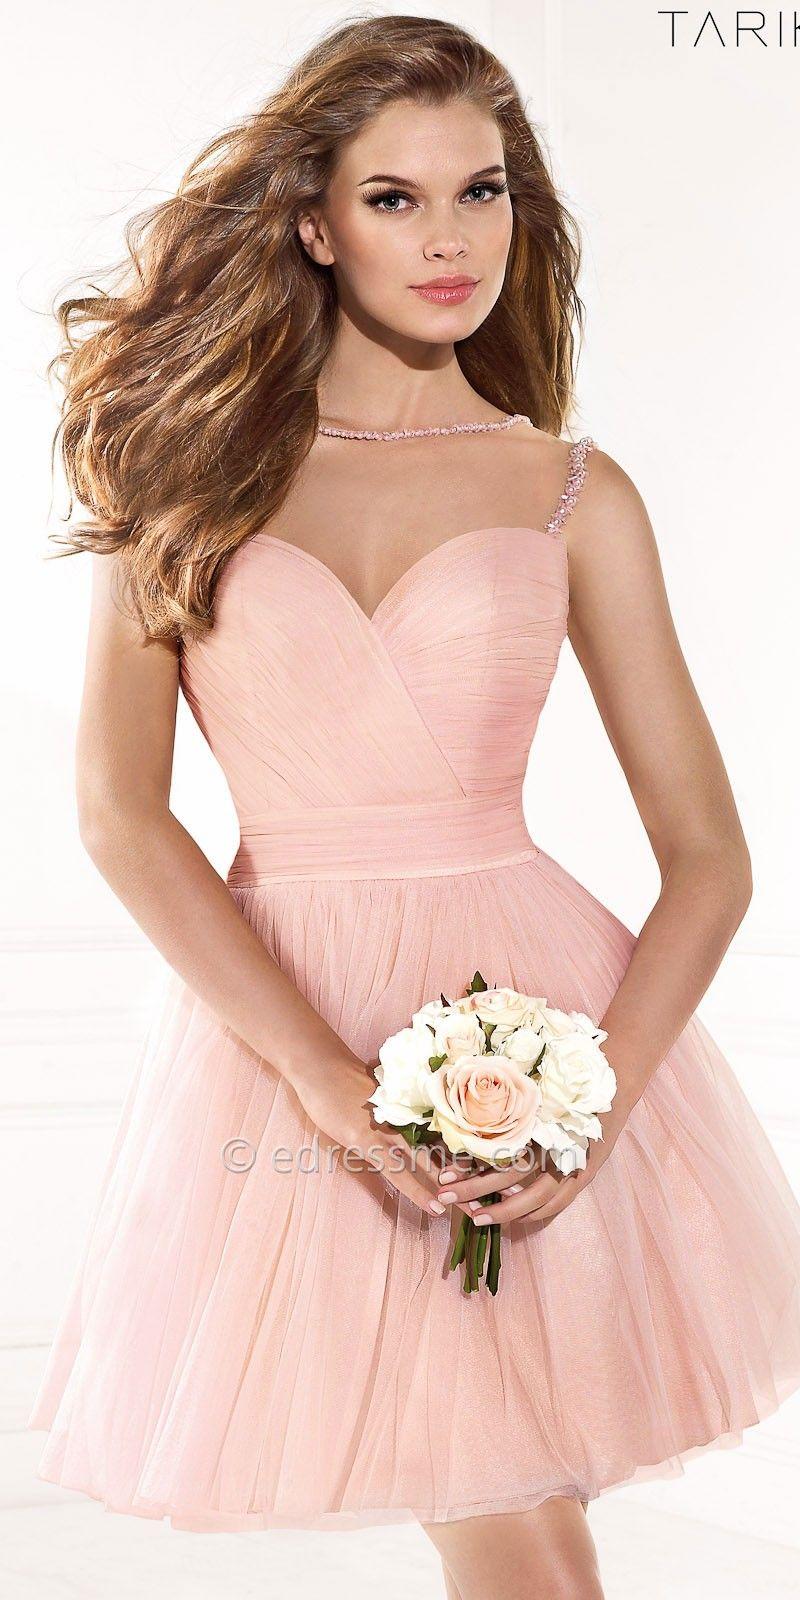 Lenda cocktail dresses by Tarik Ediz | Several Shades of Pink ...